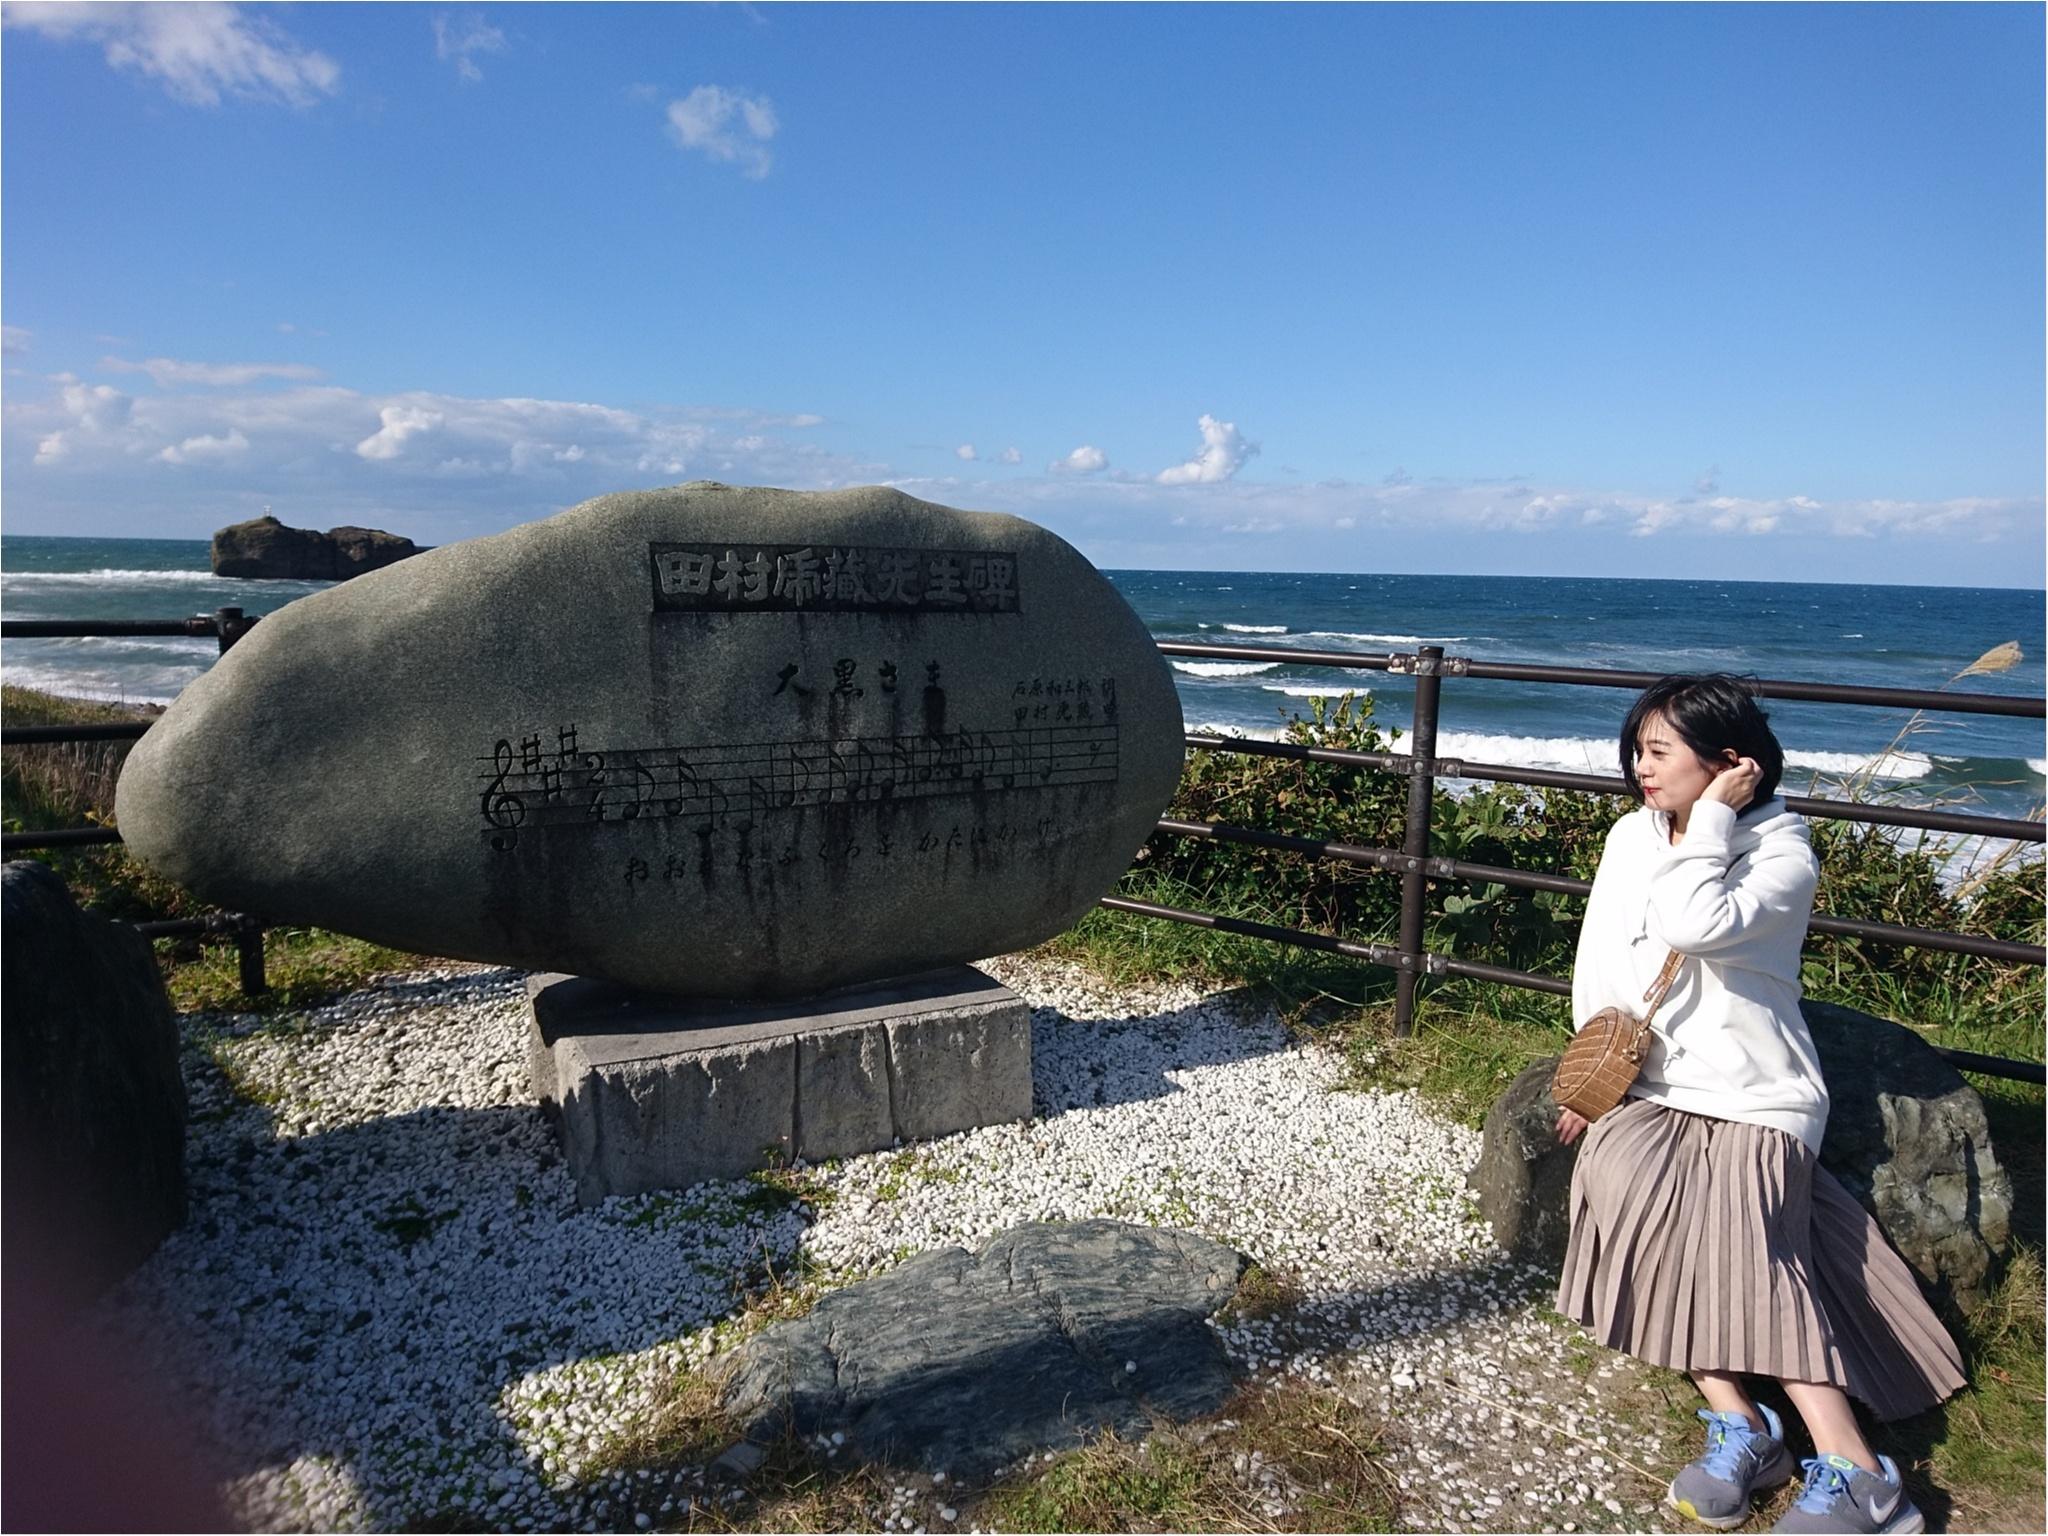 ≪関西・日帰り旅行≫鳥取旅 最後は神話&恋人の聖地で健康・良縁祈願☆ _4